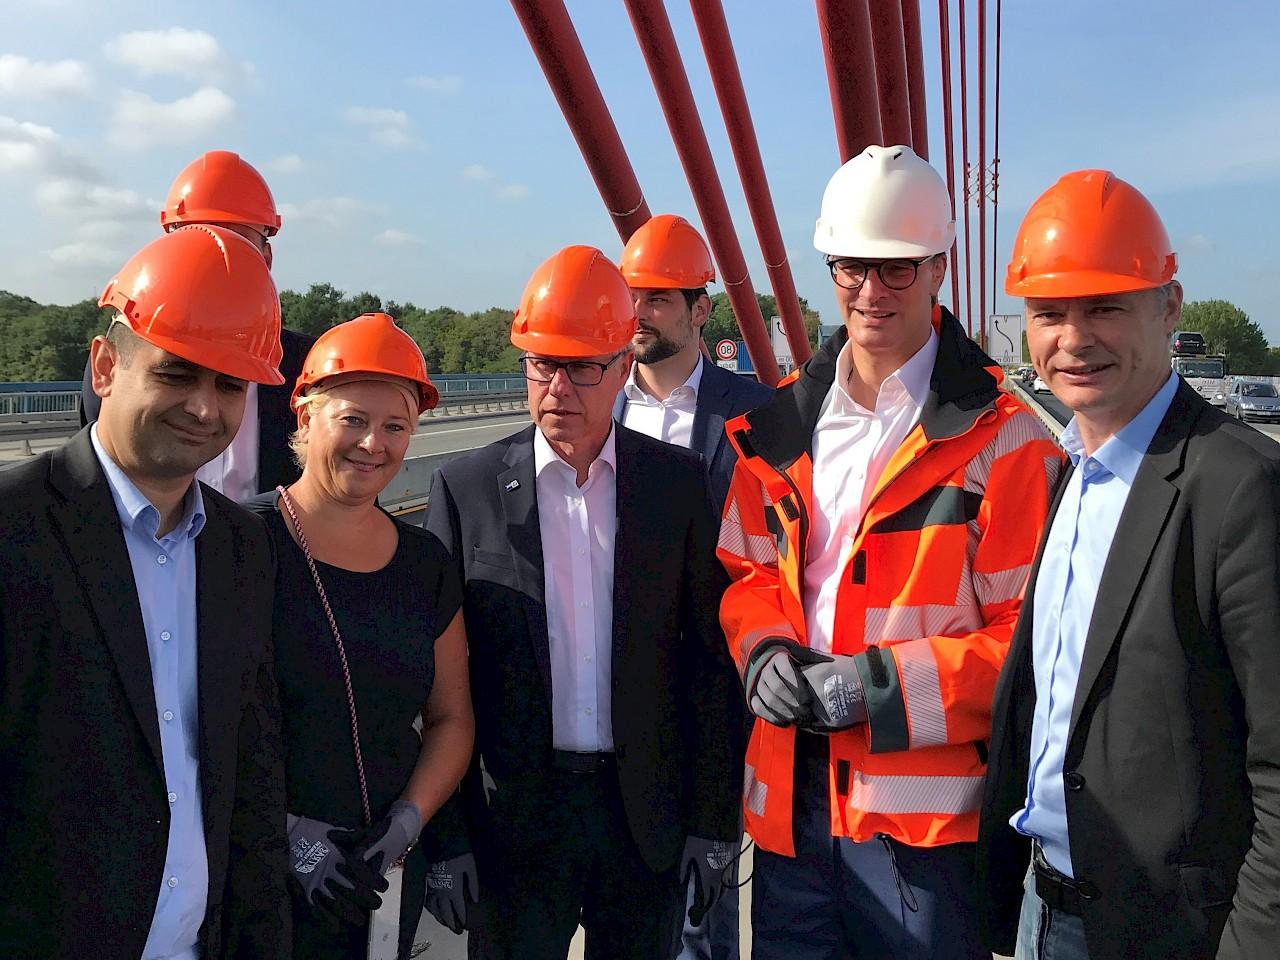 Foto: Dr. Jörg Geerlings, Hendrik Wüst, Jürgen Steinmetz, Heike Troles, Bijan Djir-Sarai (von links nach rechts)